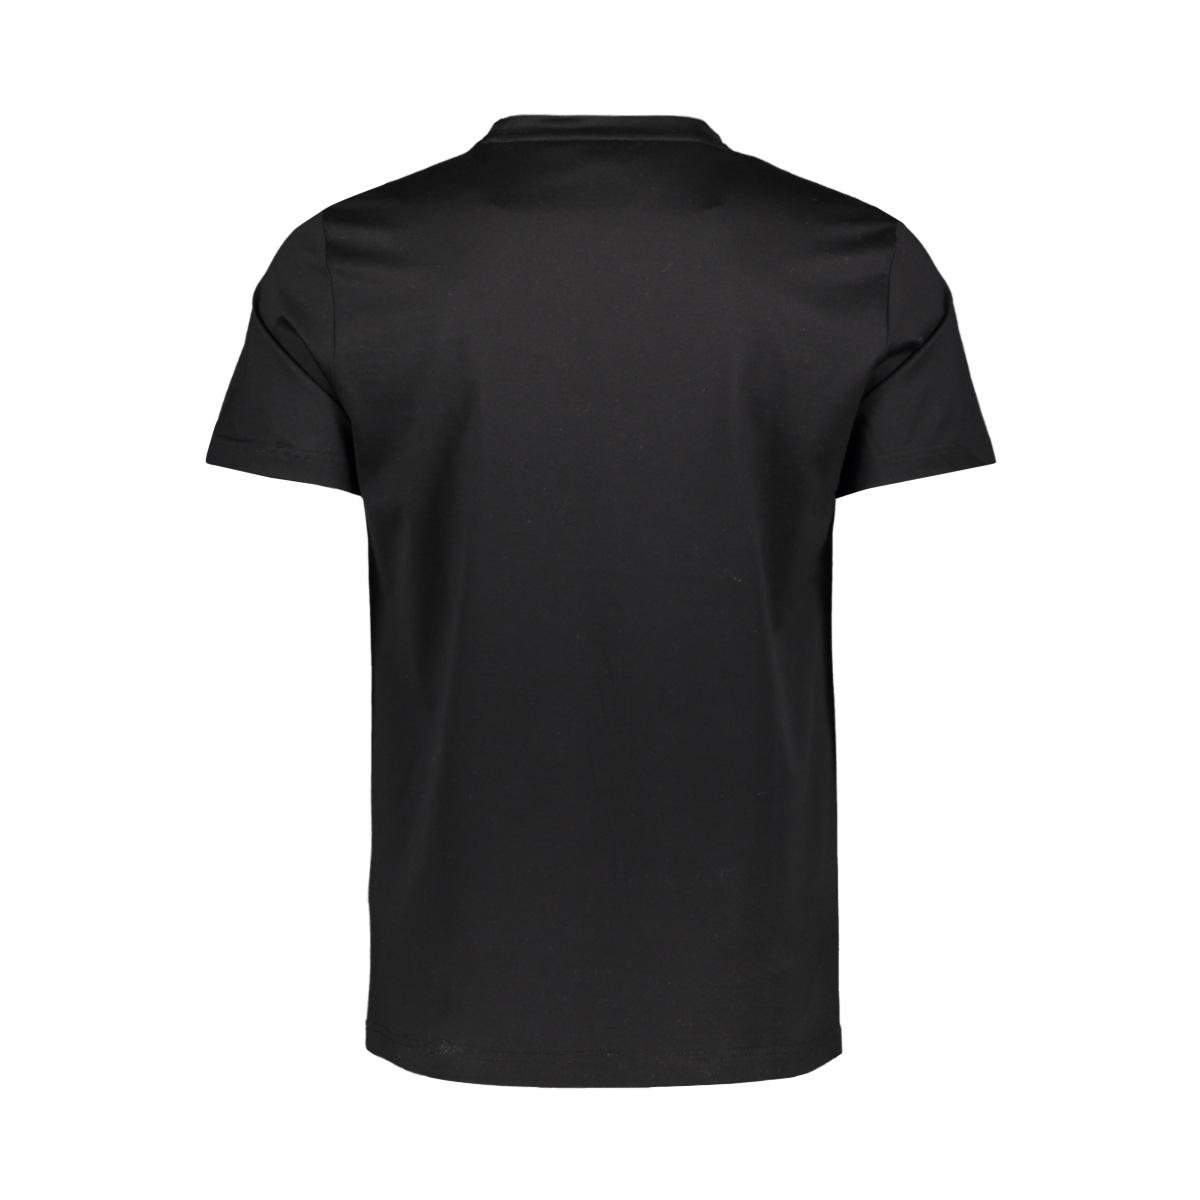 t shirt round collar mmks01818 antony morato t-shirt 9000 black